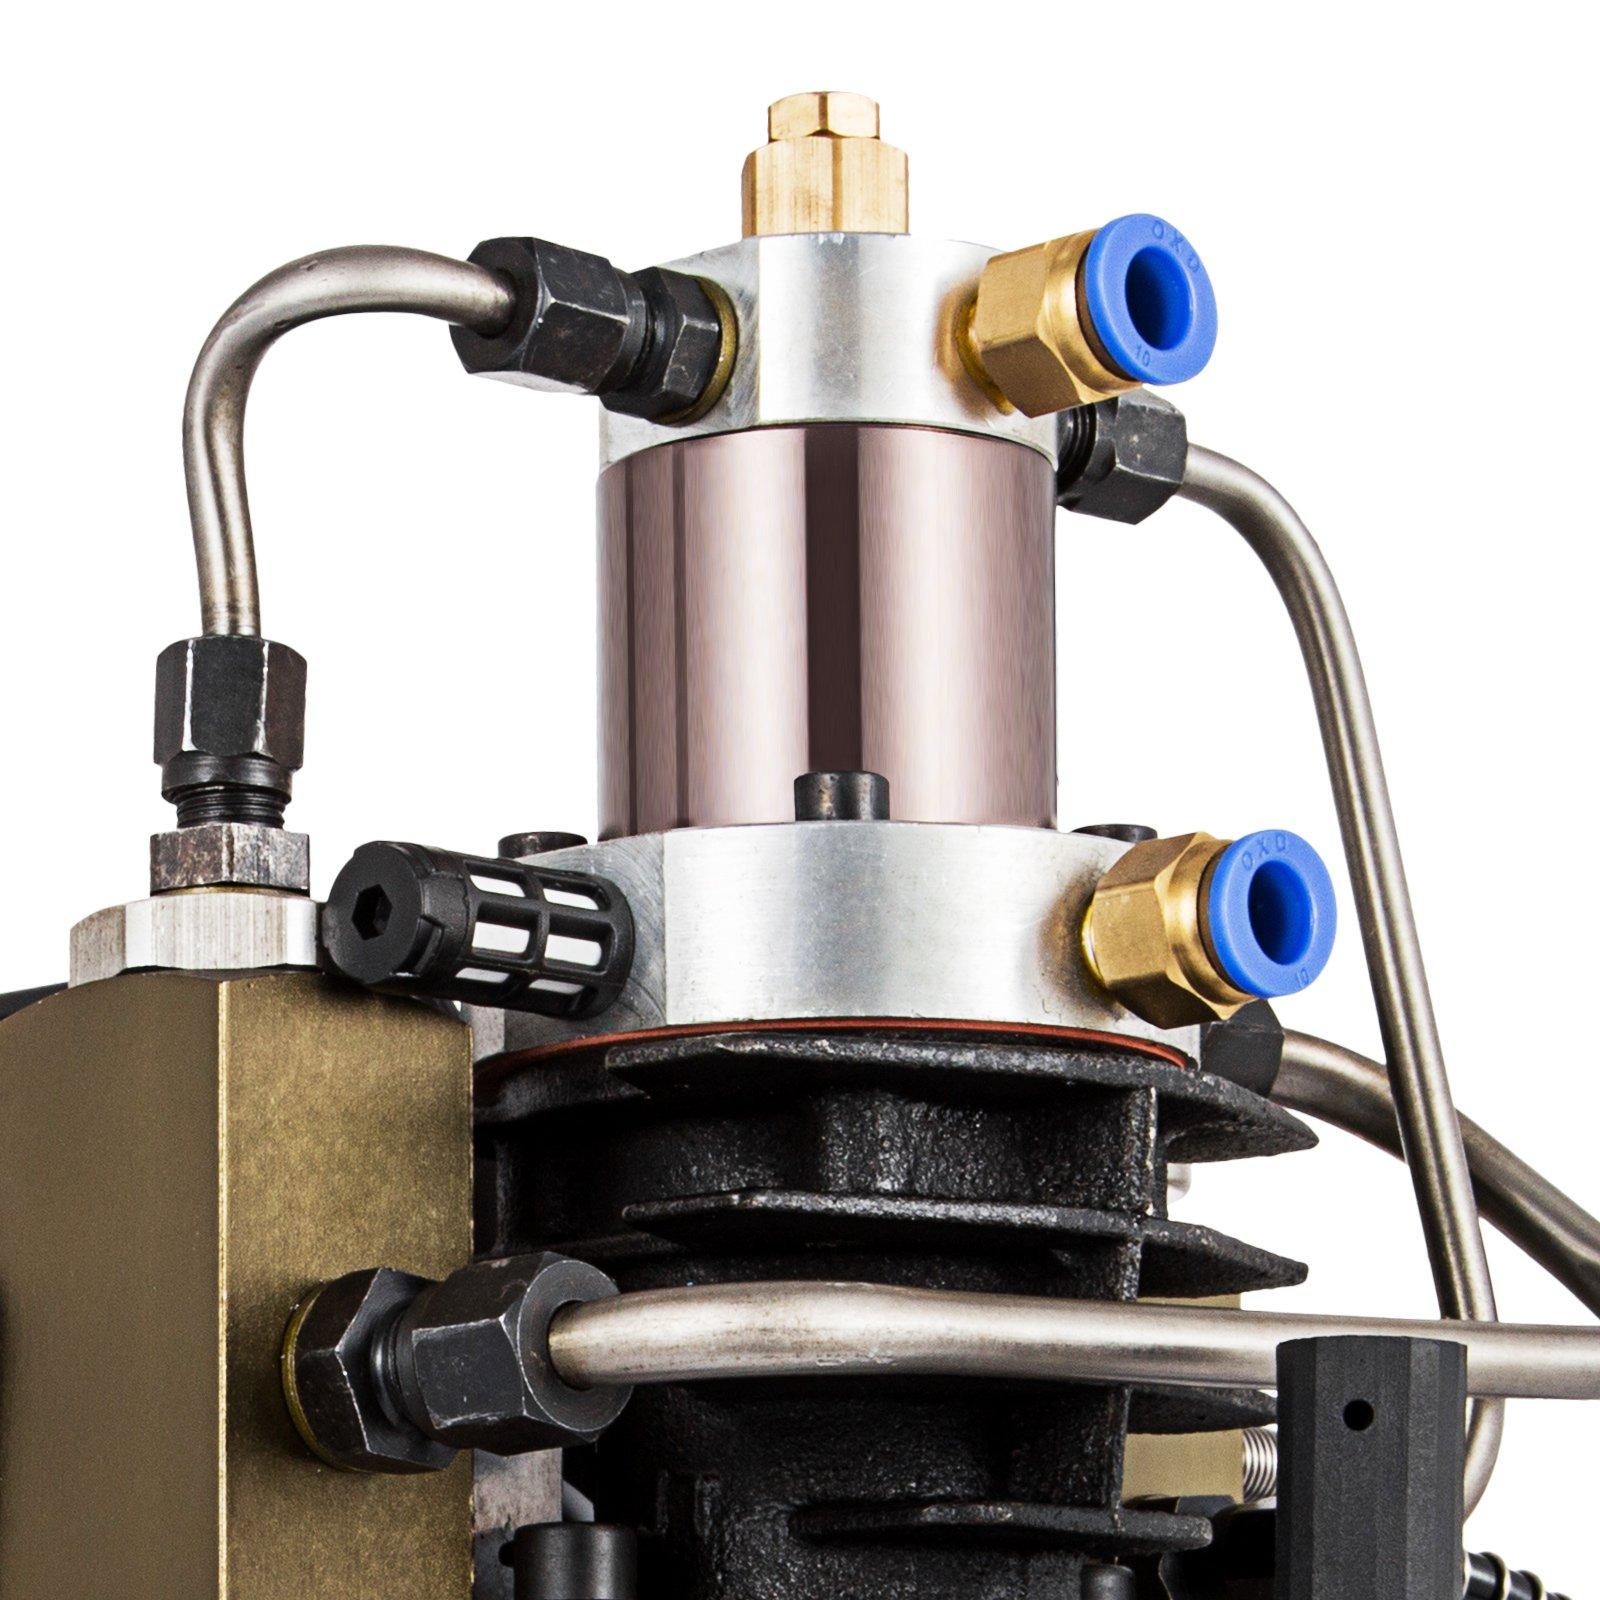 VEVOR High Pressure Air Pump 110V 30Mpa Air Compressor Electric Air